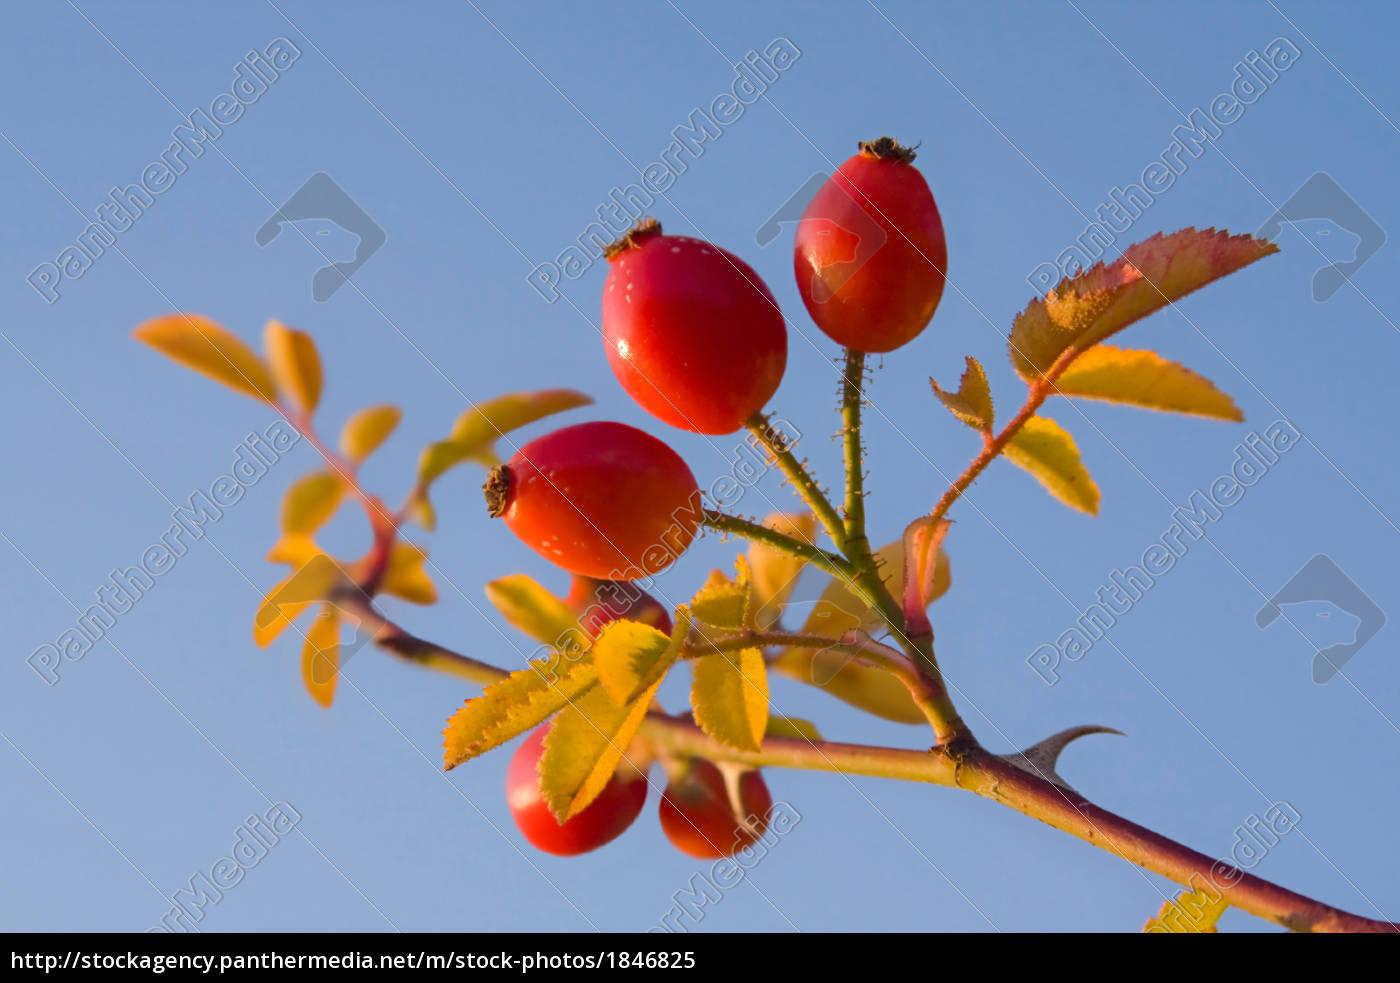 rose, hip - 1846825